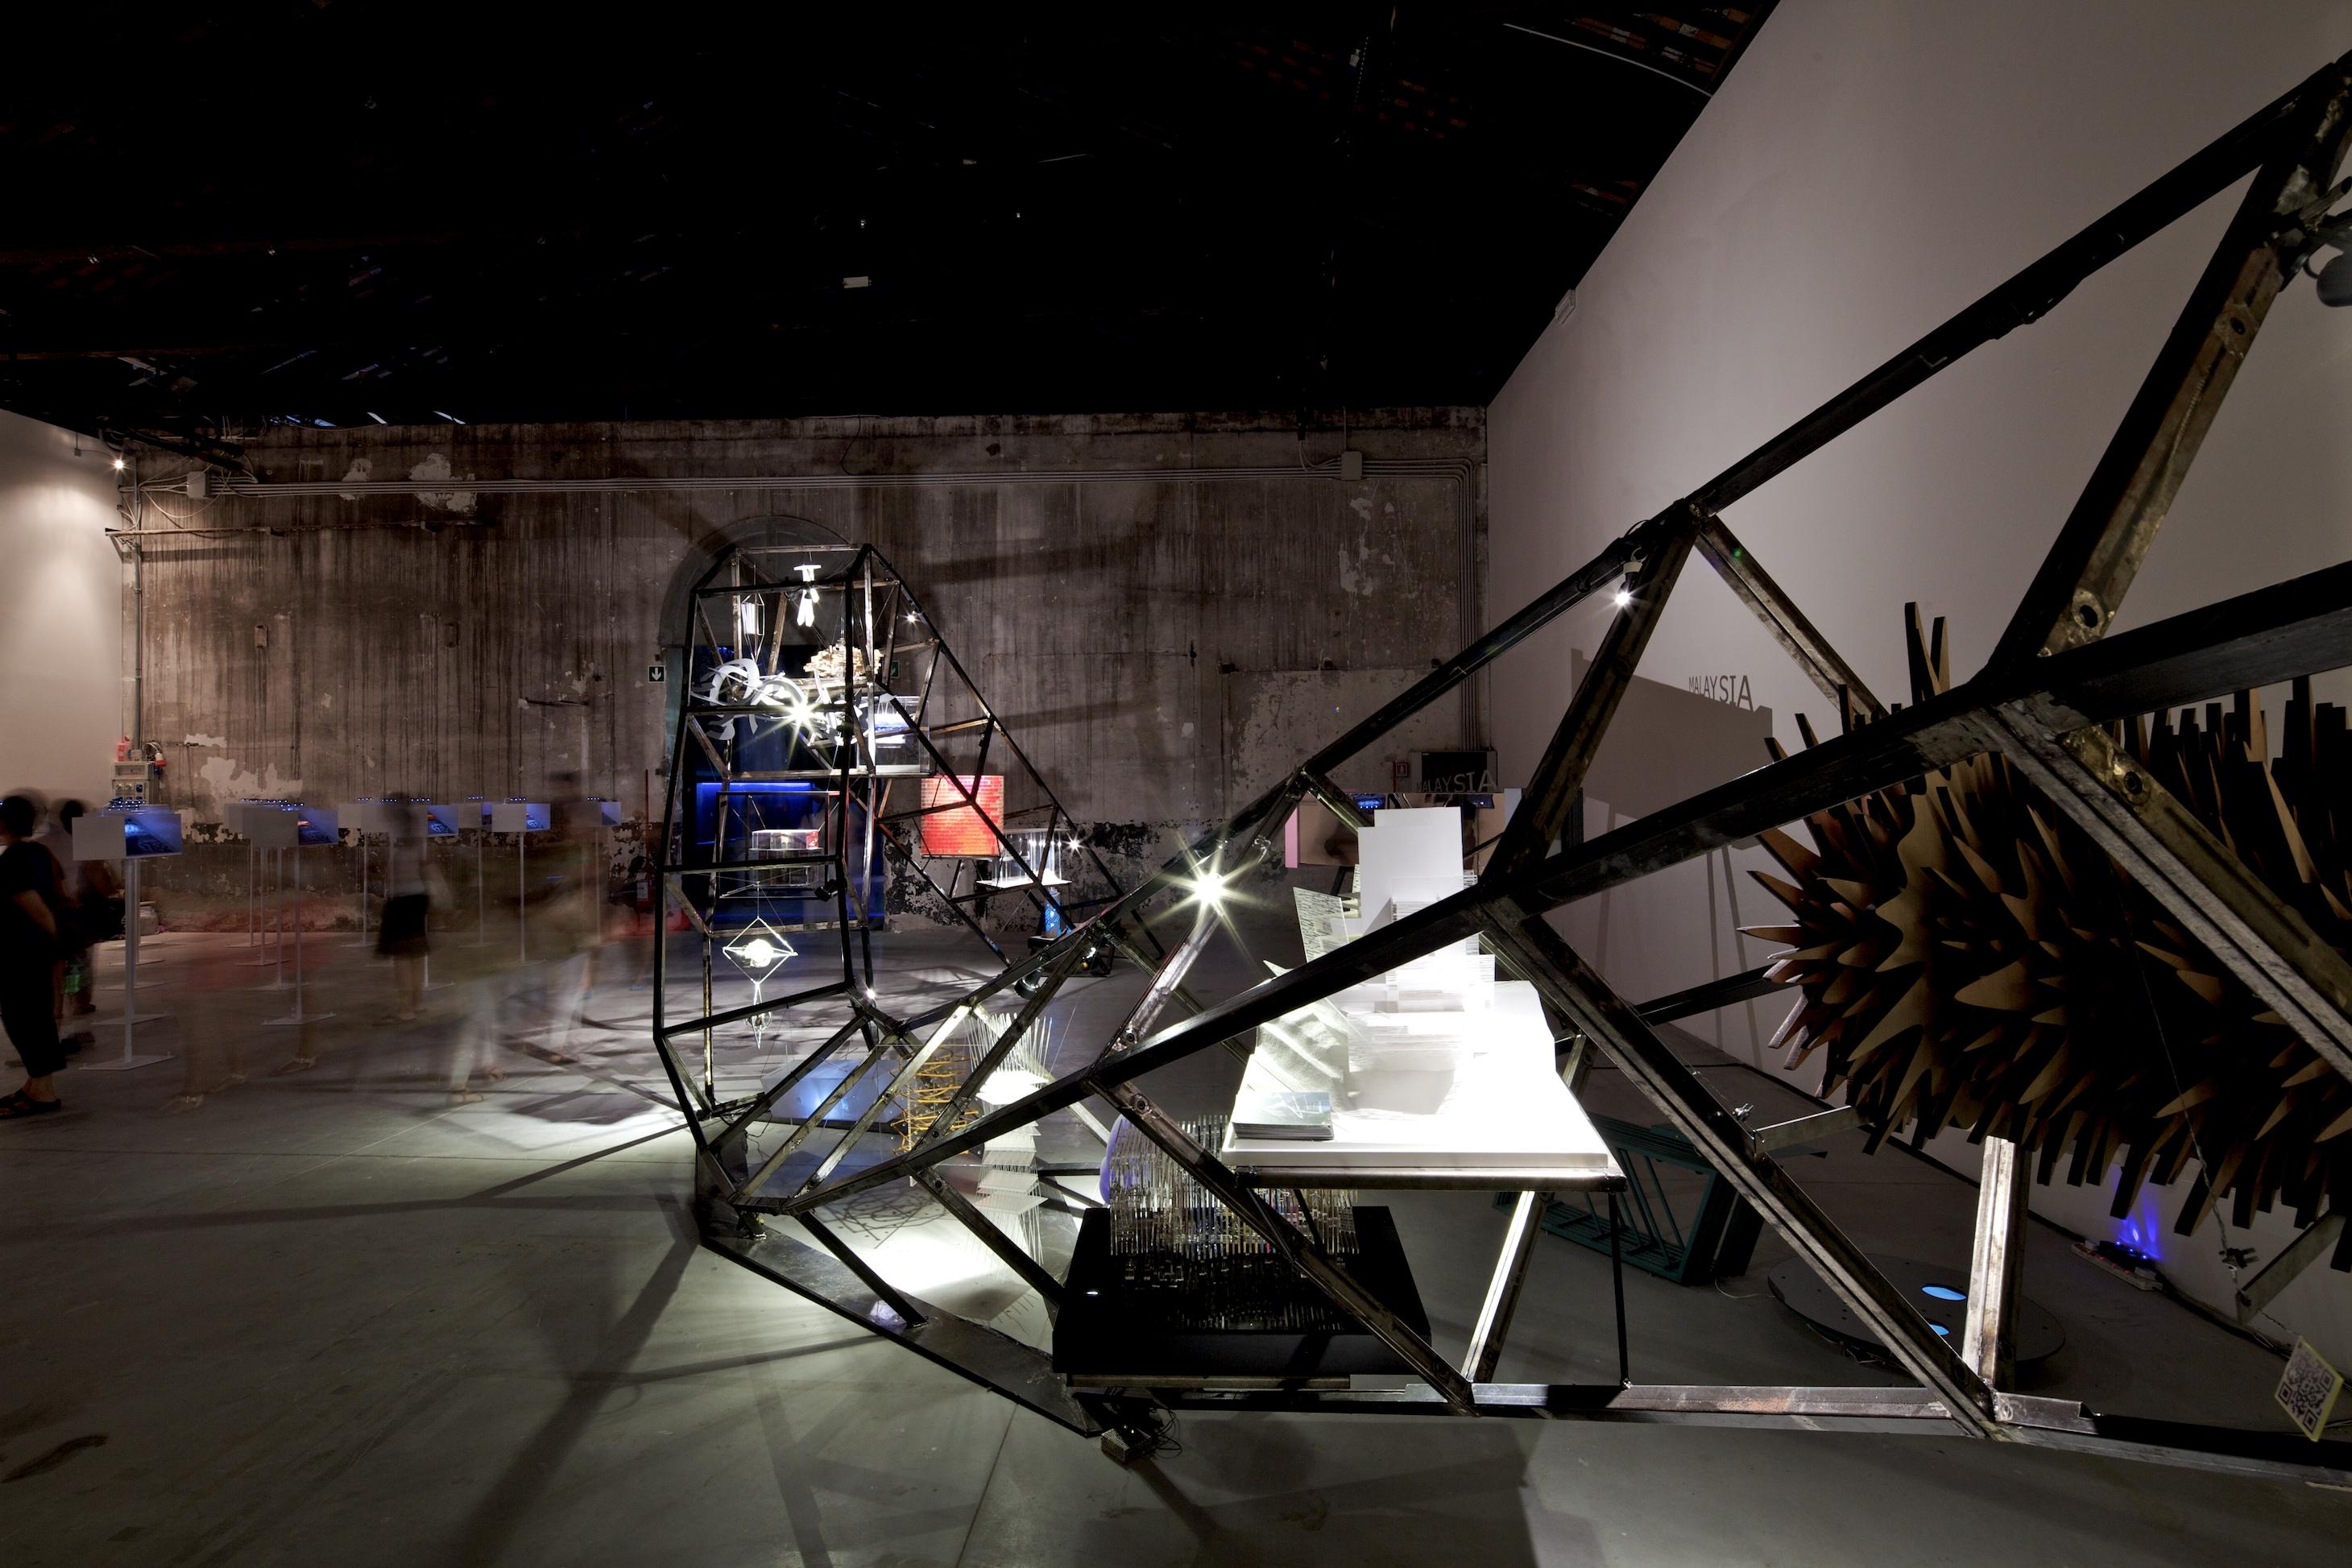 Bienal de Veneza 2012: Vozes - Pavilhão da Malásia, © Nico Saieh